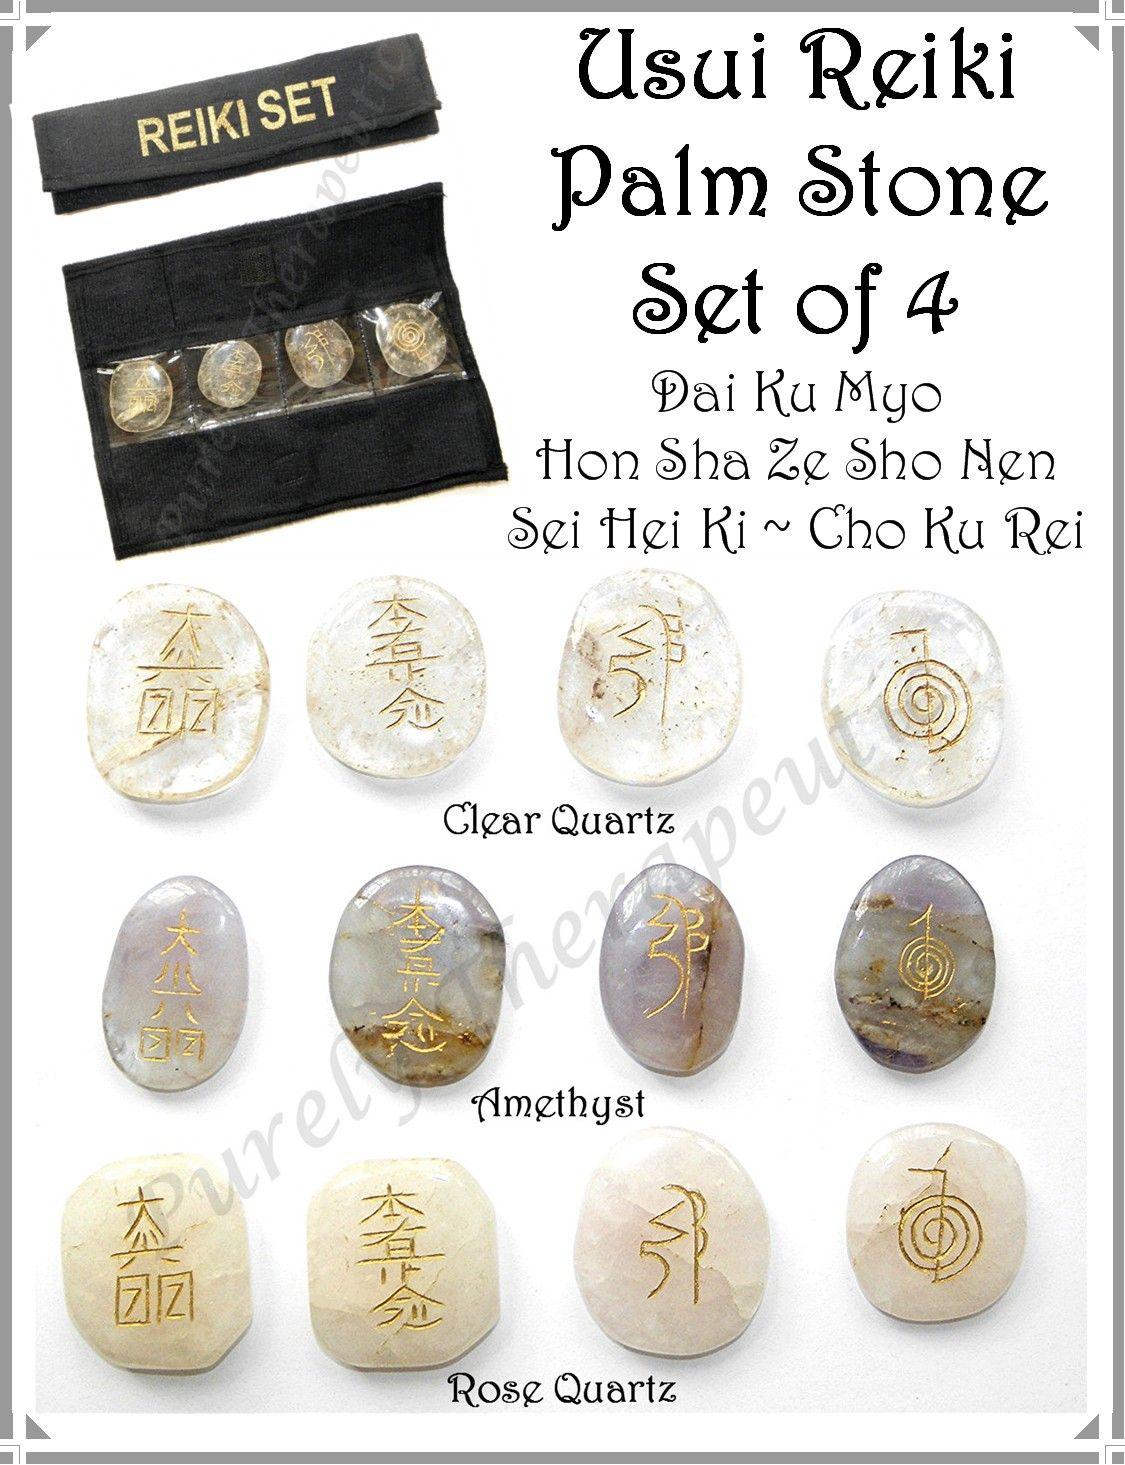 Set of 4 usui engraved reiki palm stones 4 gemstone palm stones set of 4 usui engraved reiki palm stones 4 gemstone palm stones have the 4 reiki symbols hand carved into them dai ku myomaster symbol hon sha ze sho biocorpaavc Image collections